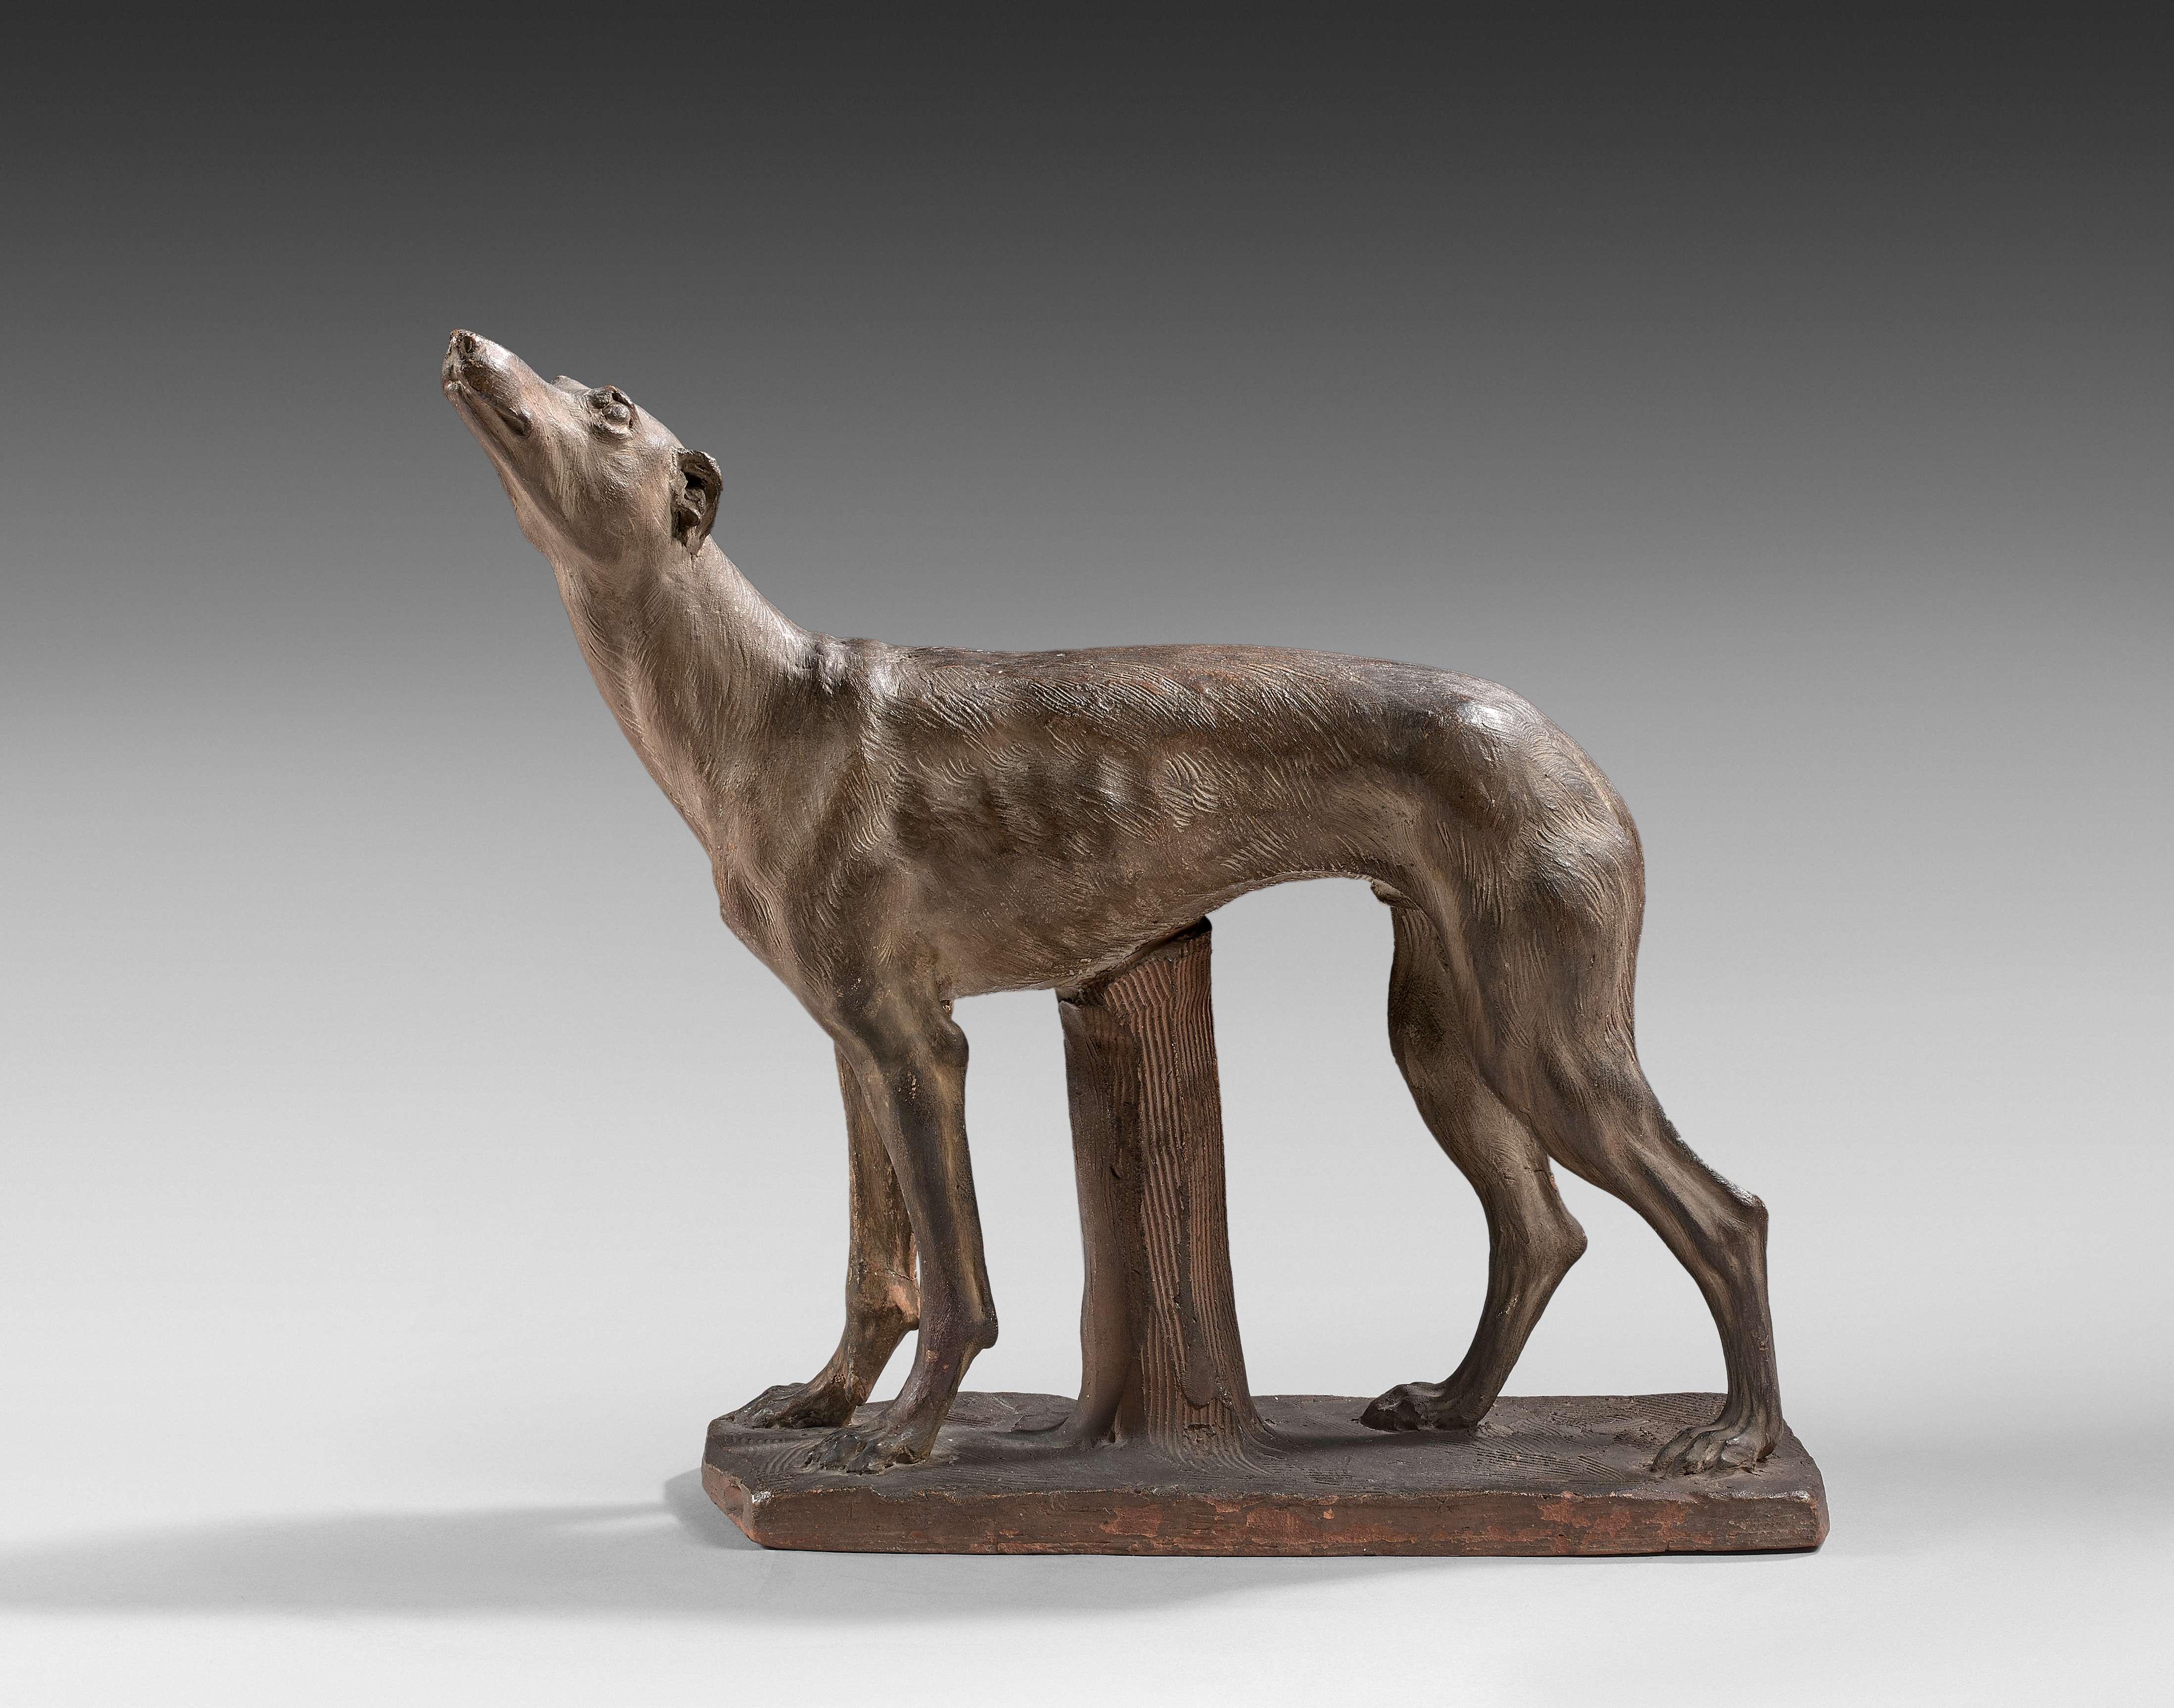 Attributed to Jean-Antoine Houdon, 'Greyhound', 1828. Photo: Artcurial